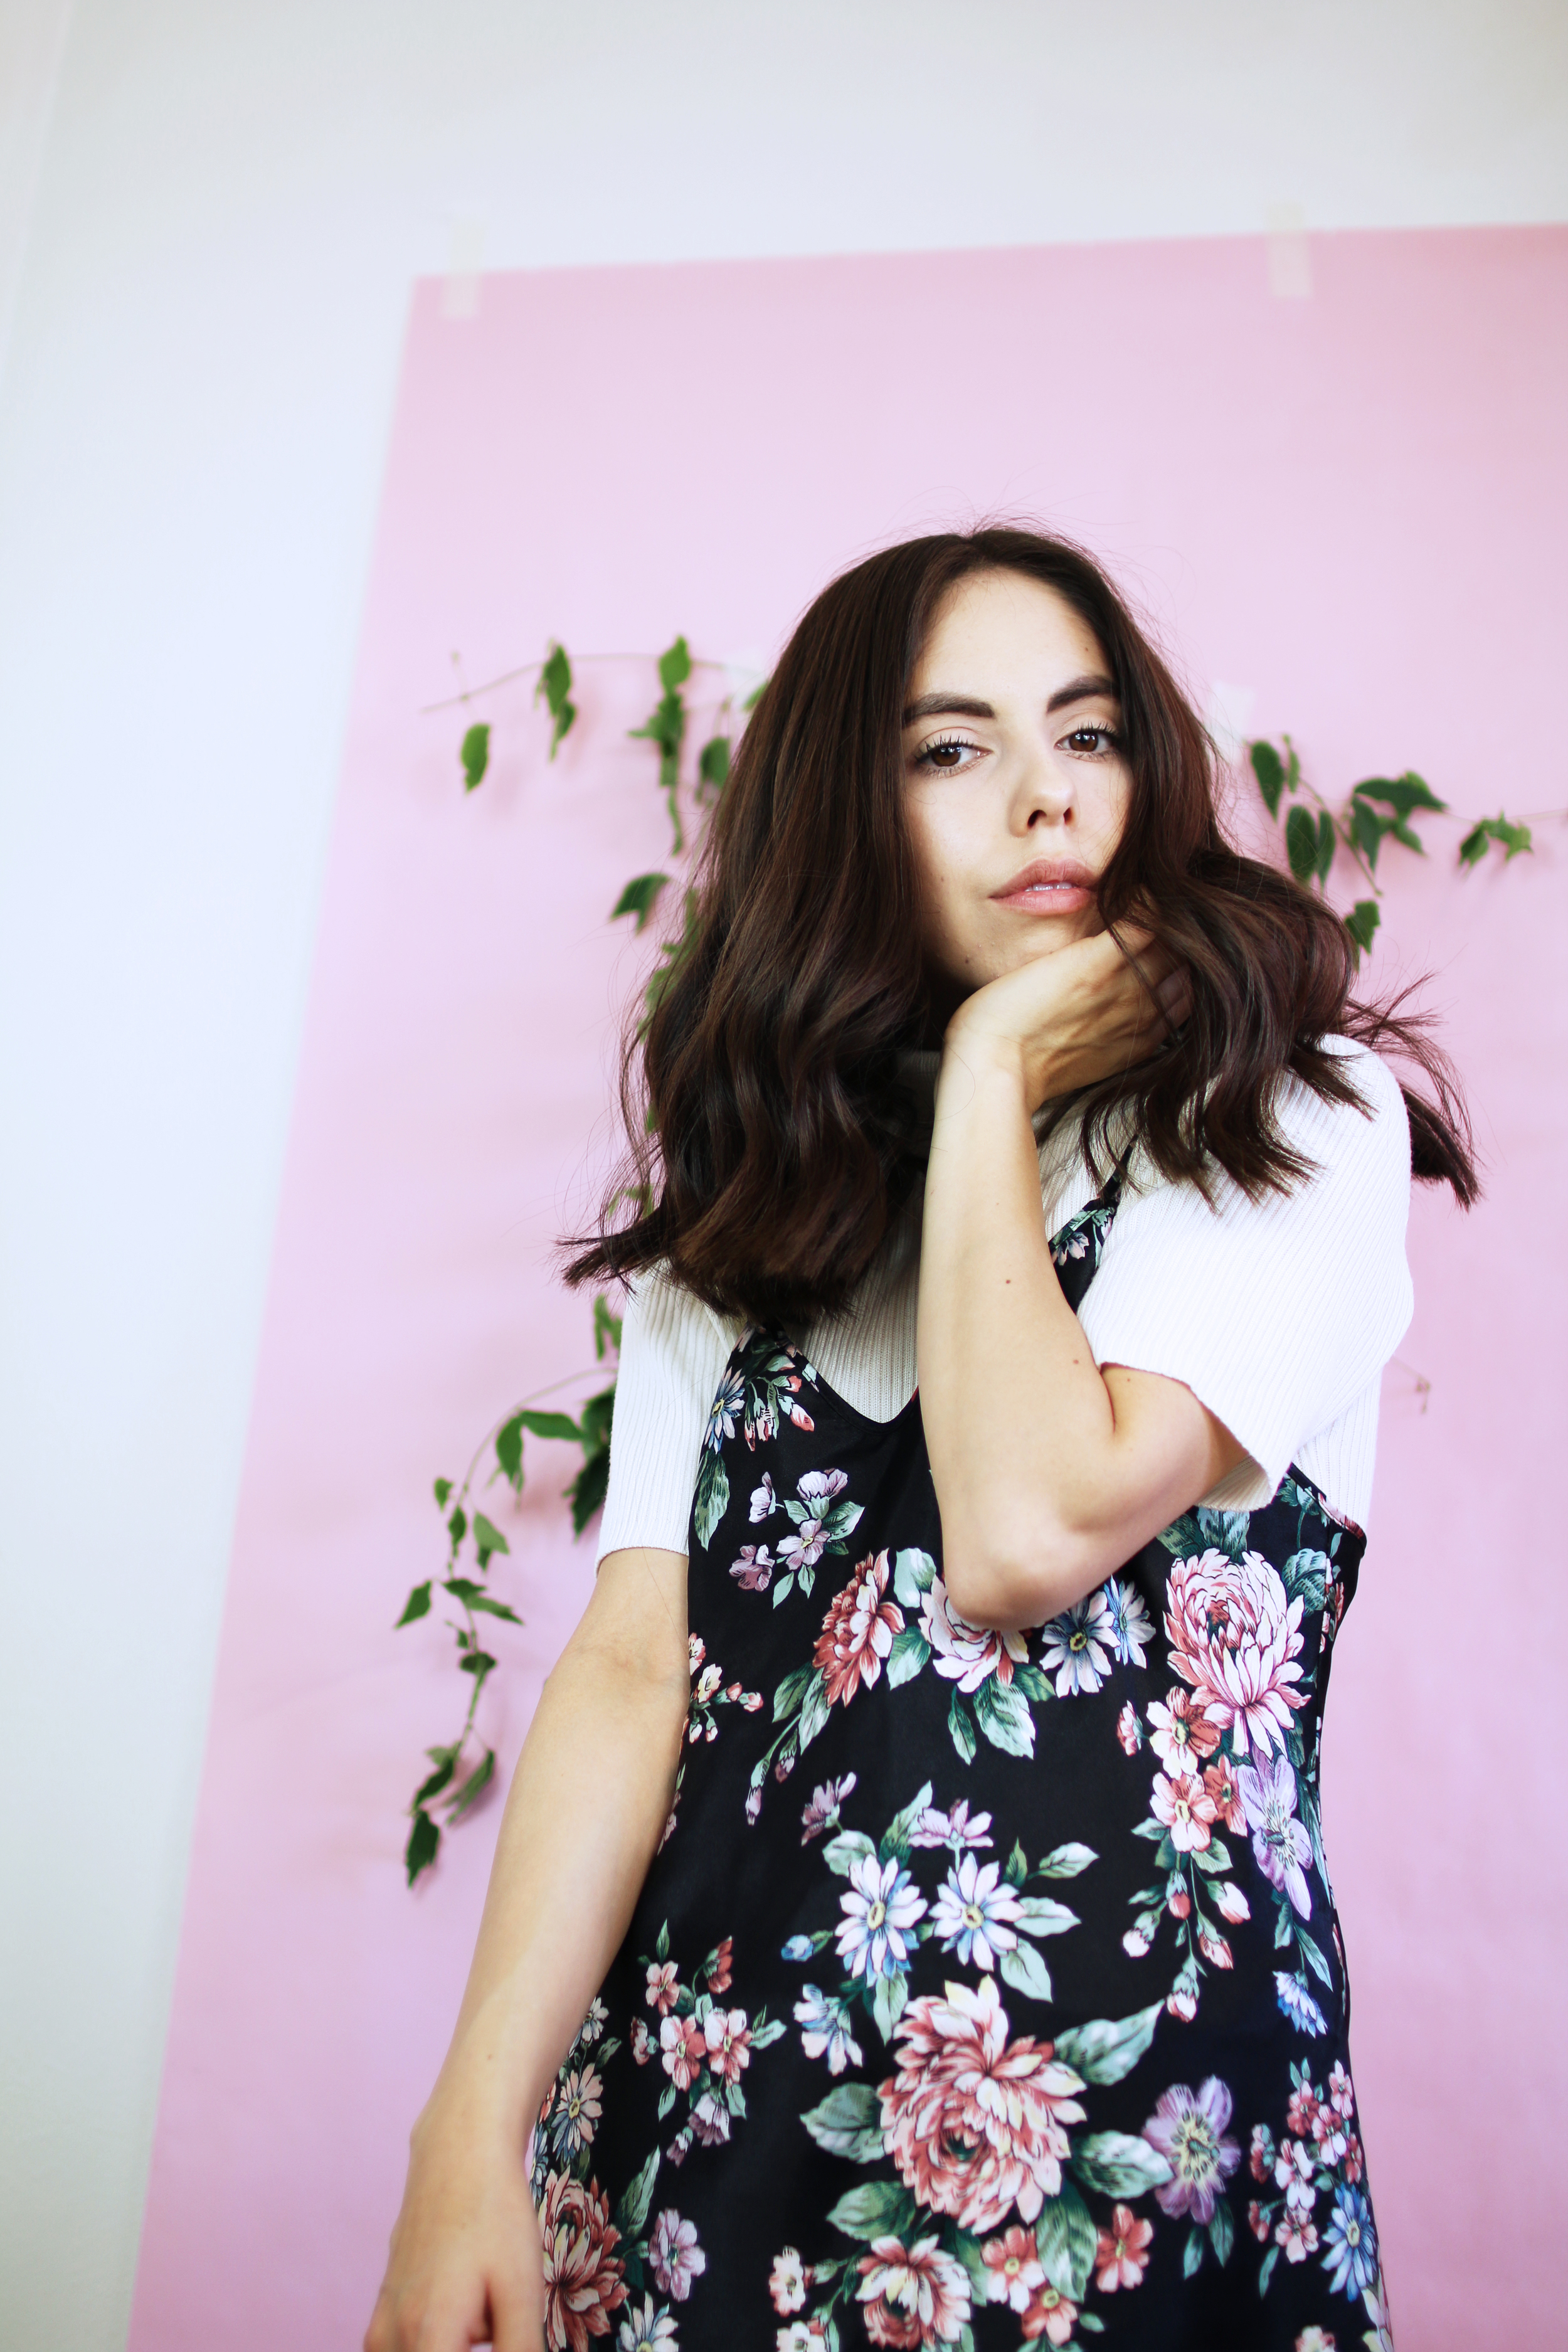 Stephanie Valenzuela/@stephanievalenzuela